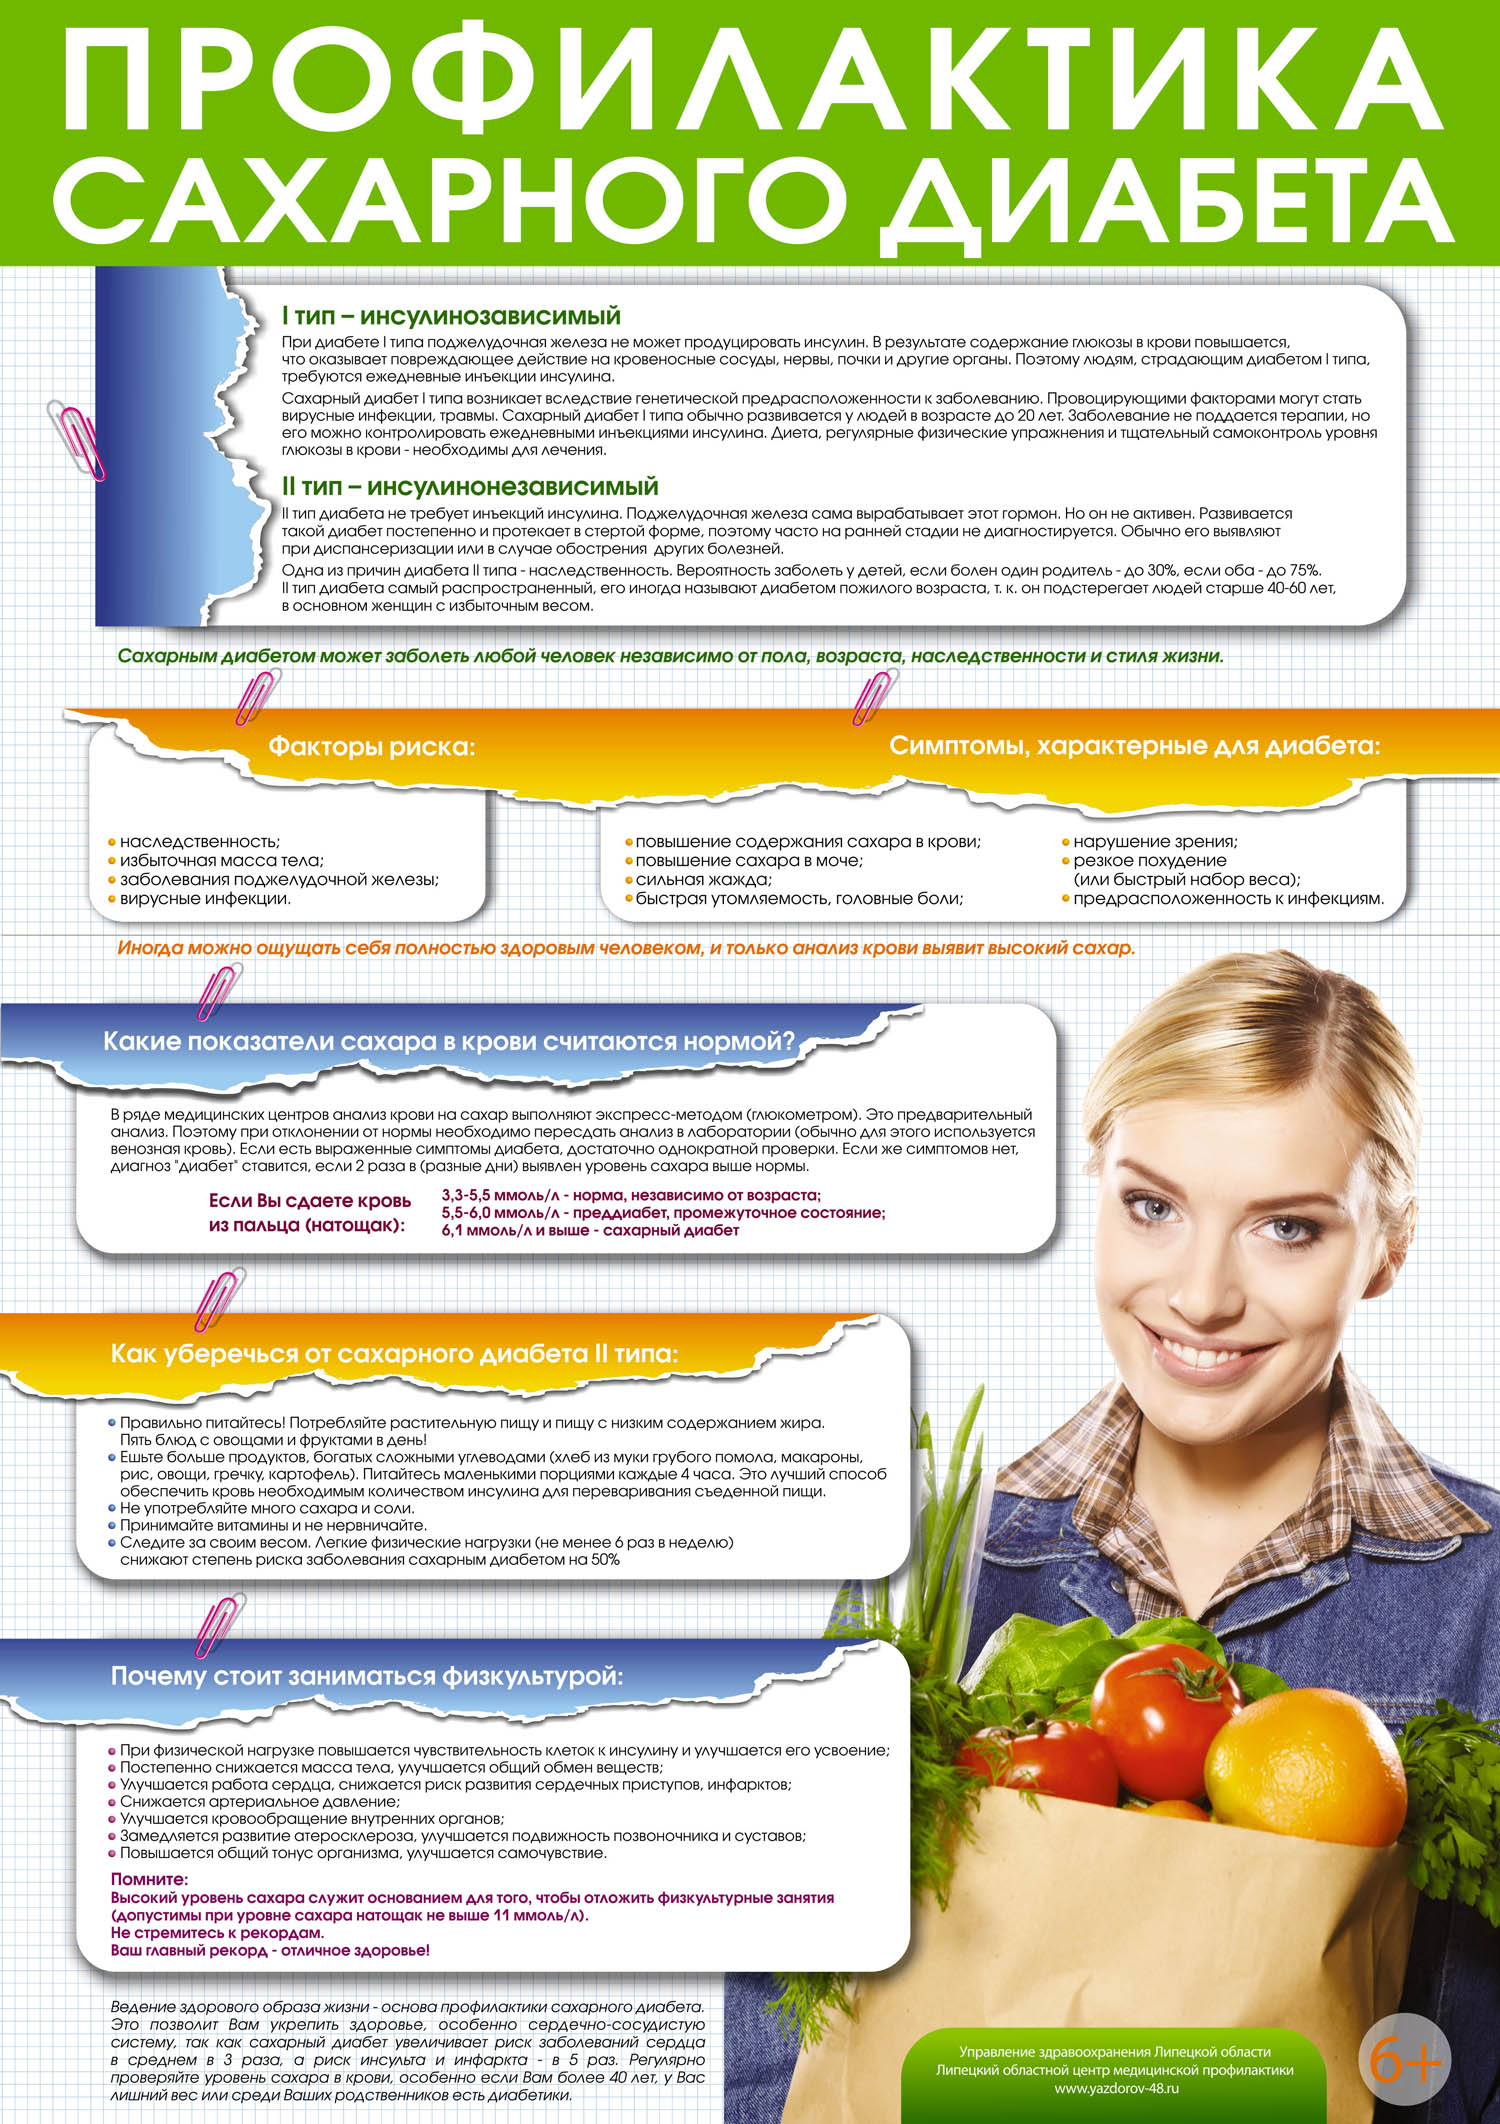 Рецепты людям с повышенным сахаром